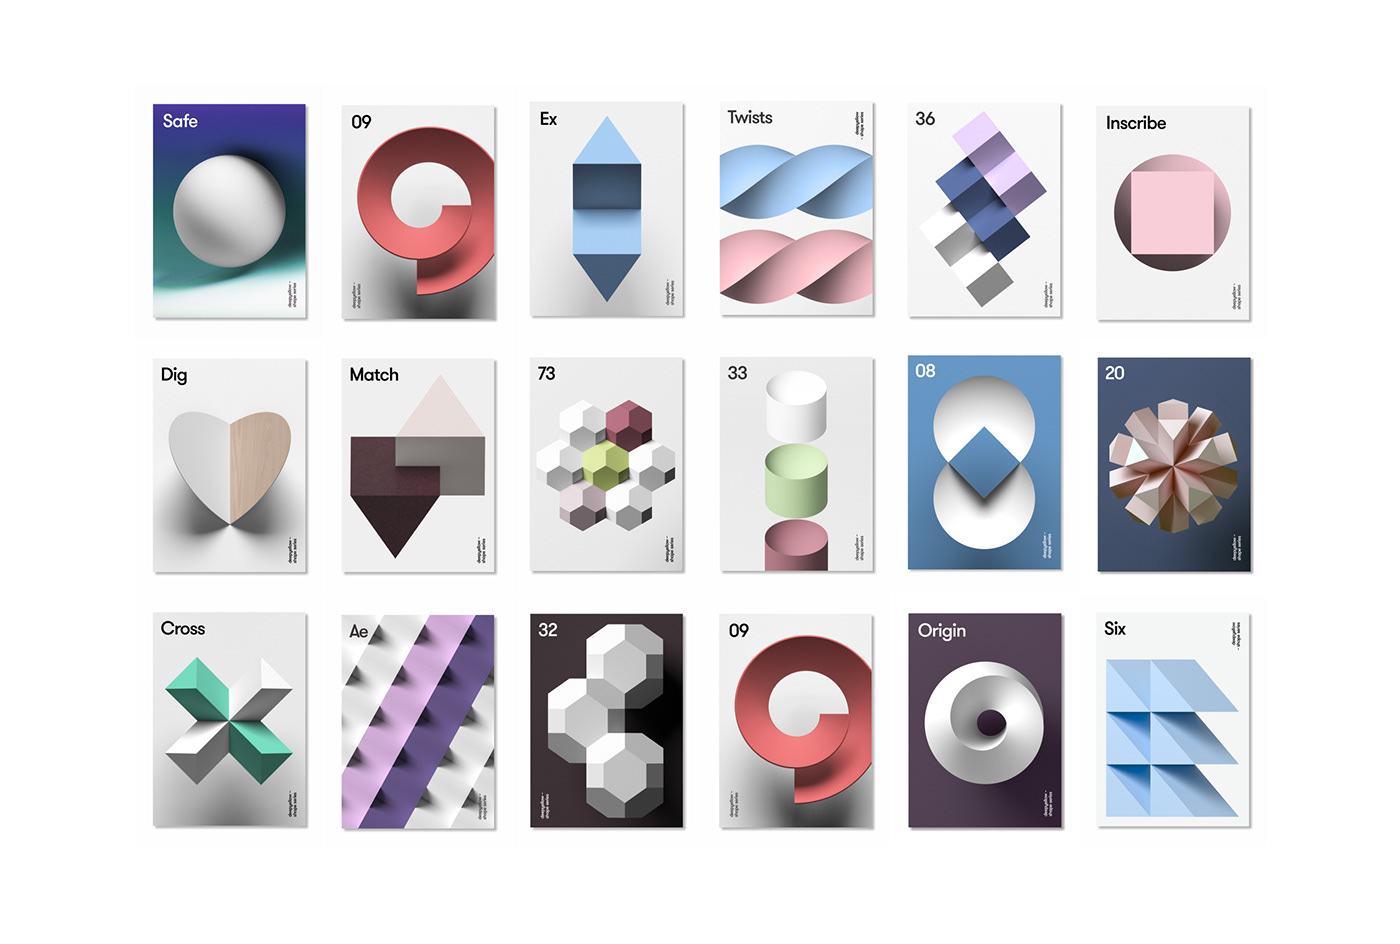 3D 3dart brand deepshape deepyellow design identity ILLUSTRATION  logo poster